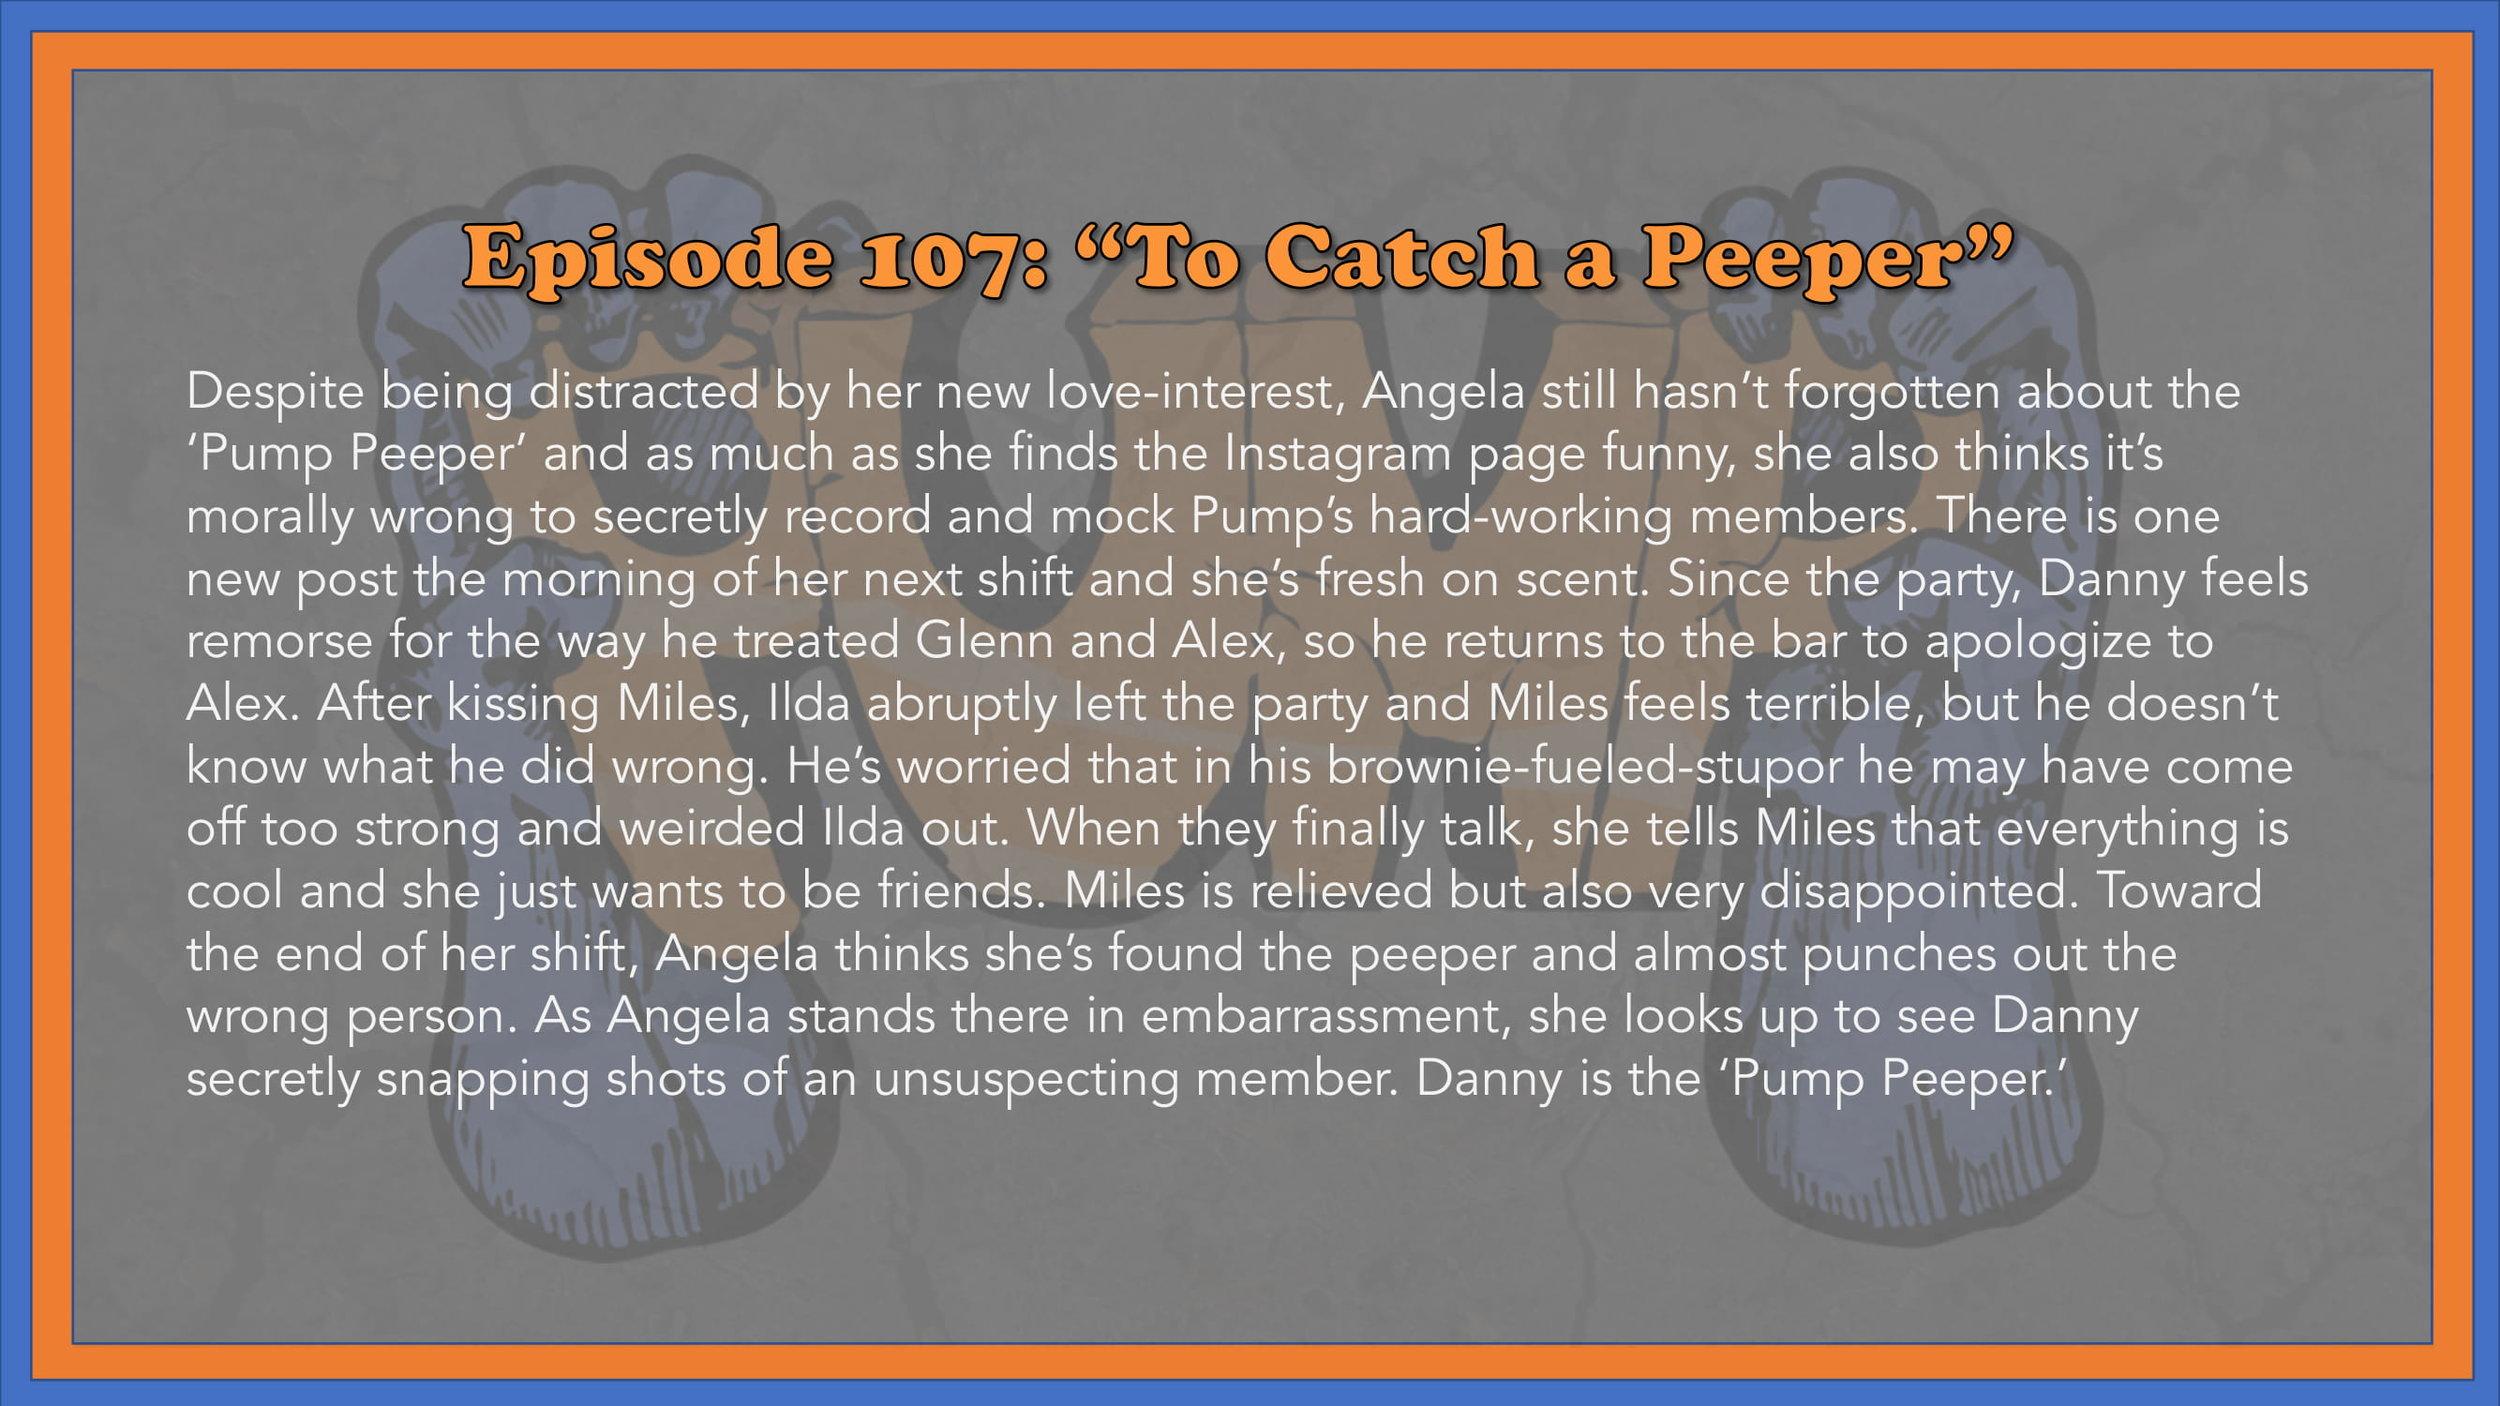 Pump Episode Outlines Season One 120618-8.jpg